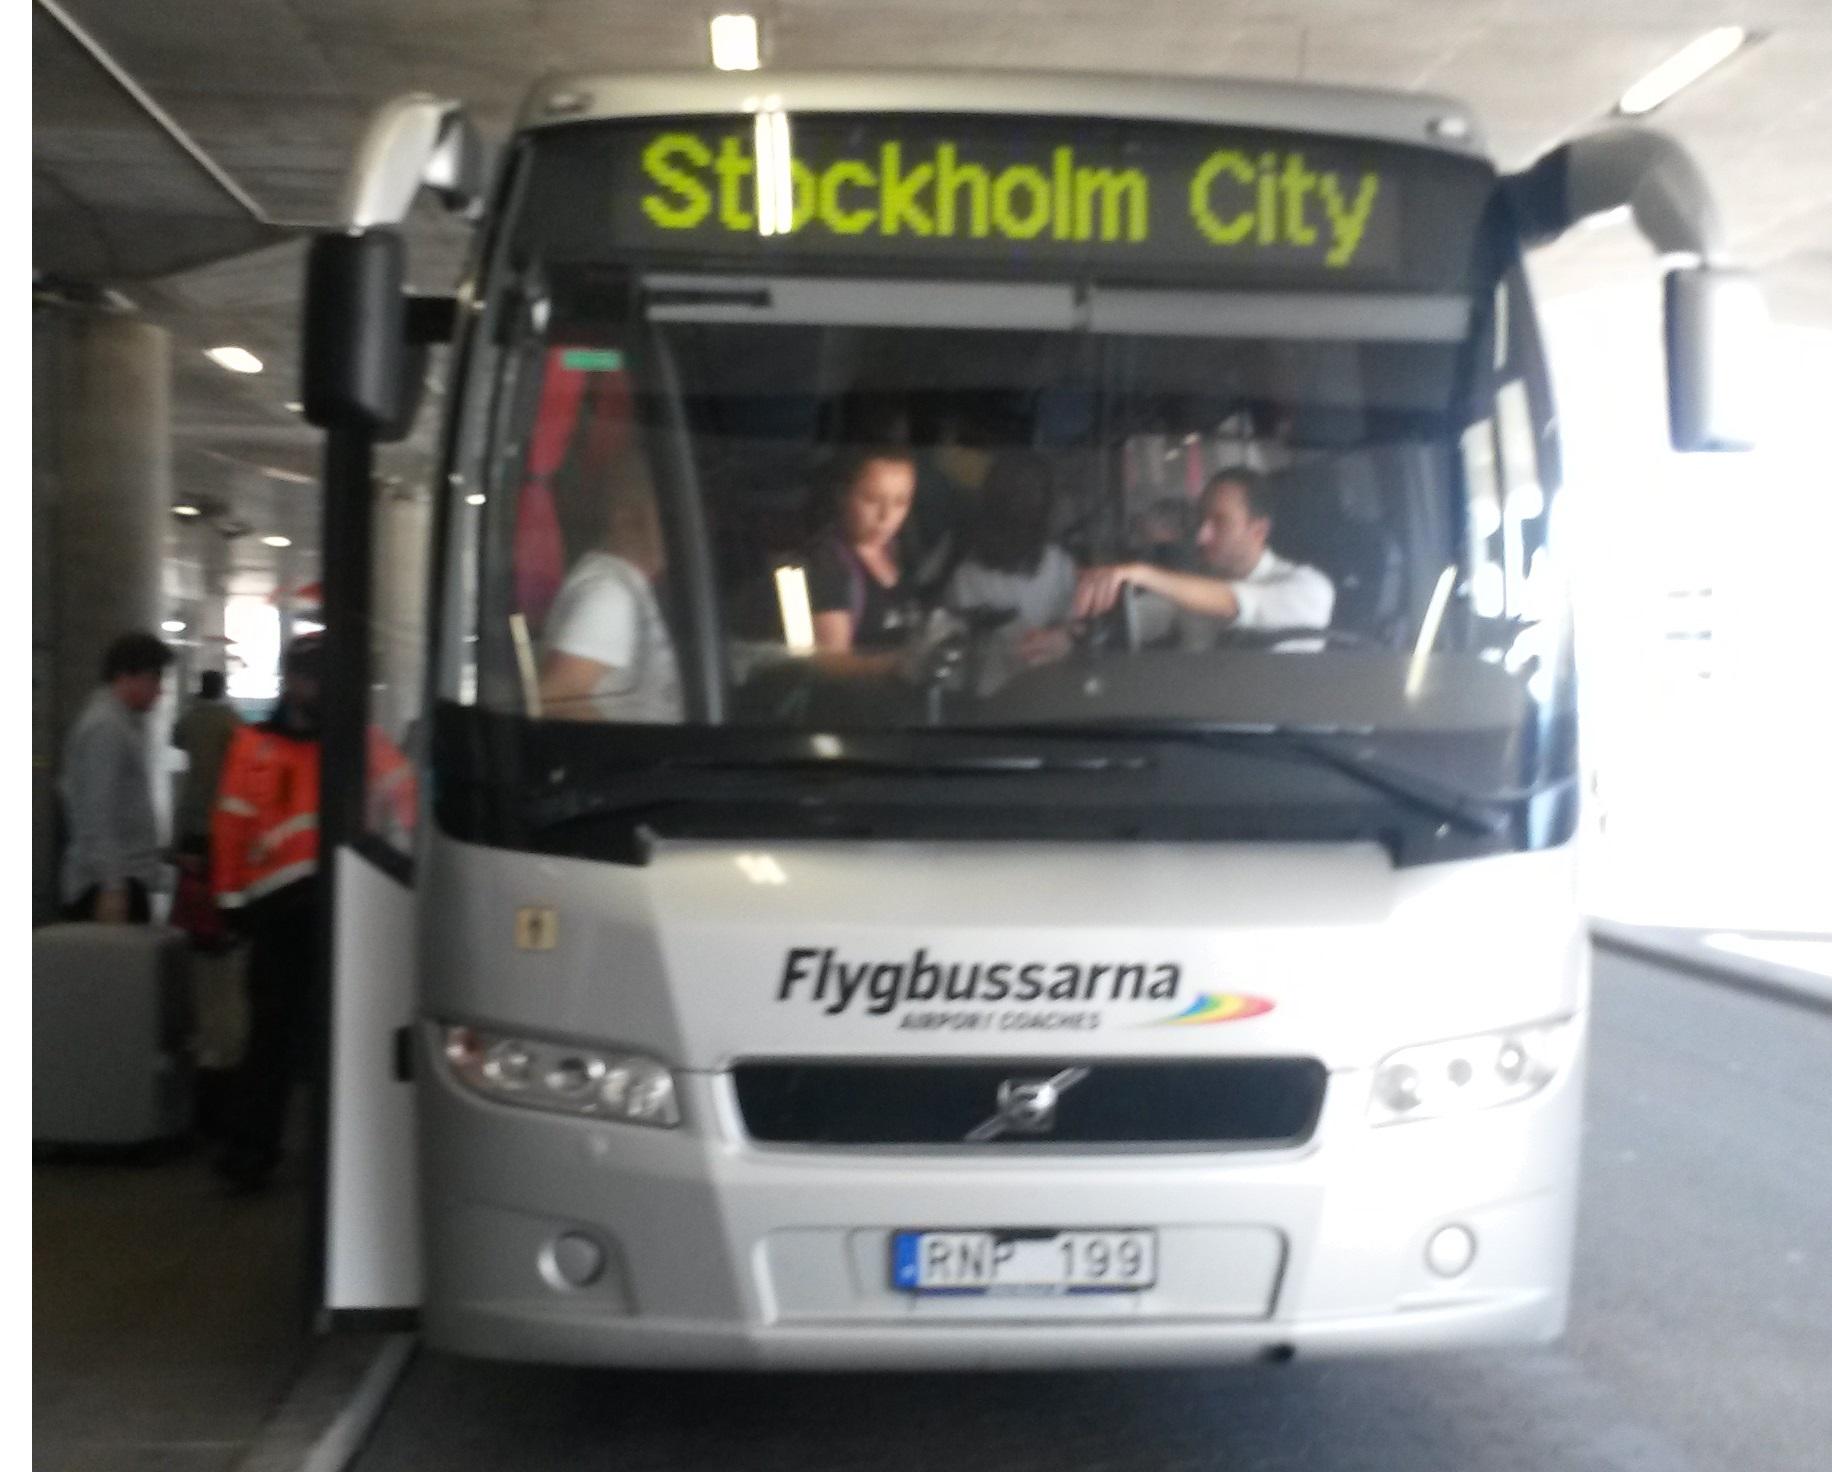 Flygbussarna, Arlanda-Stockholm servisi